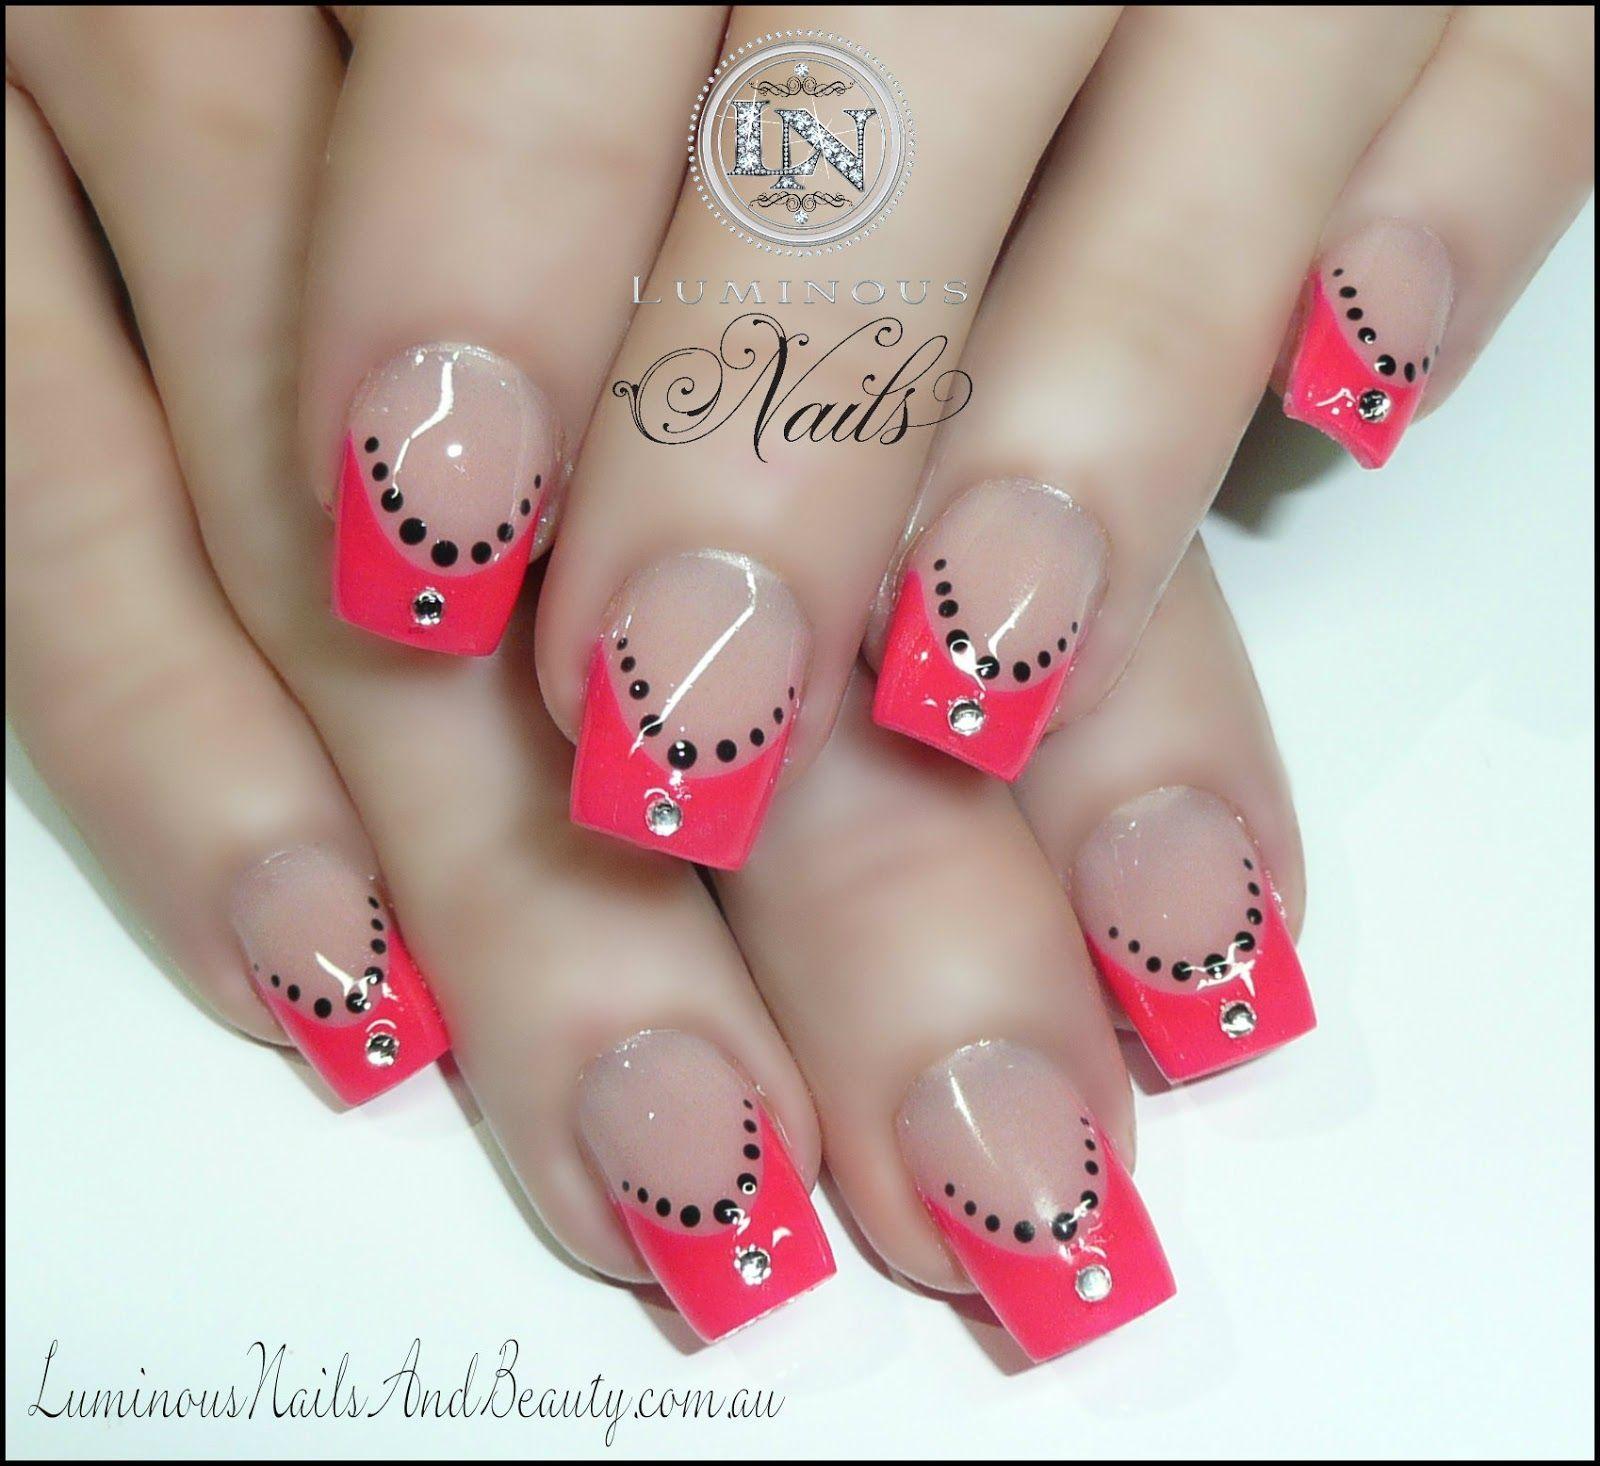 Pink Acrylic Nails | ... .+Acrylic+Nails,+Gel+Nails,+Sculptured+ ...